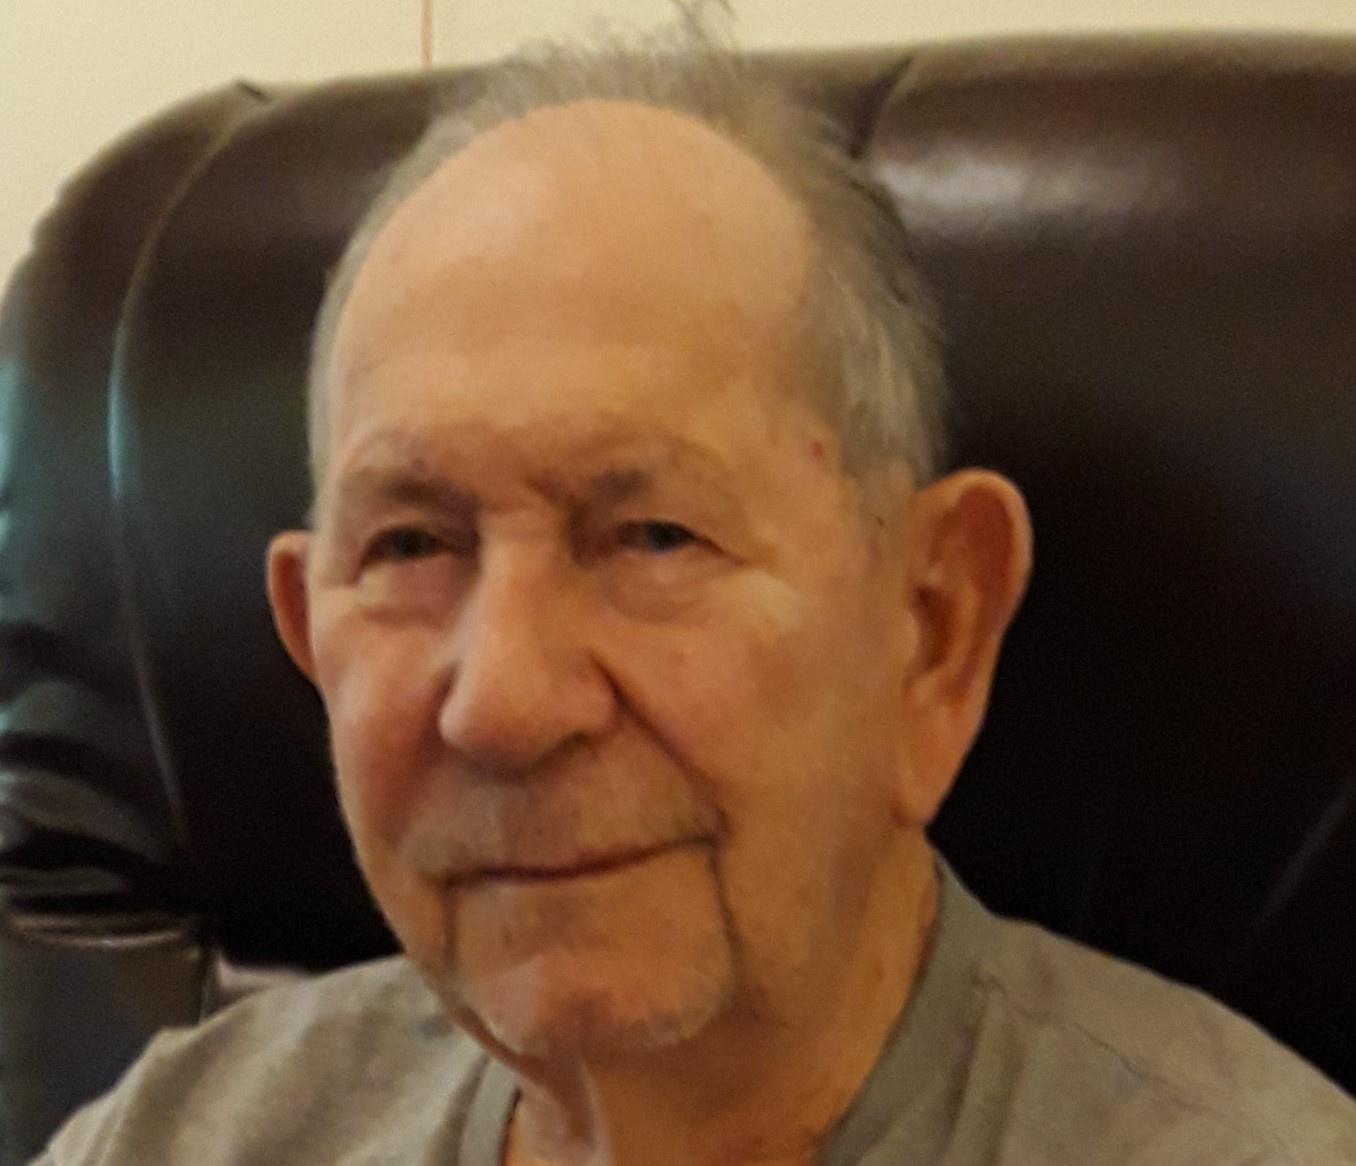 Elder Care Smyrna GA - RESIDENT SPOTLIGHT June 2021